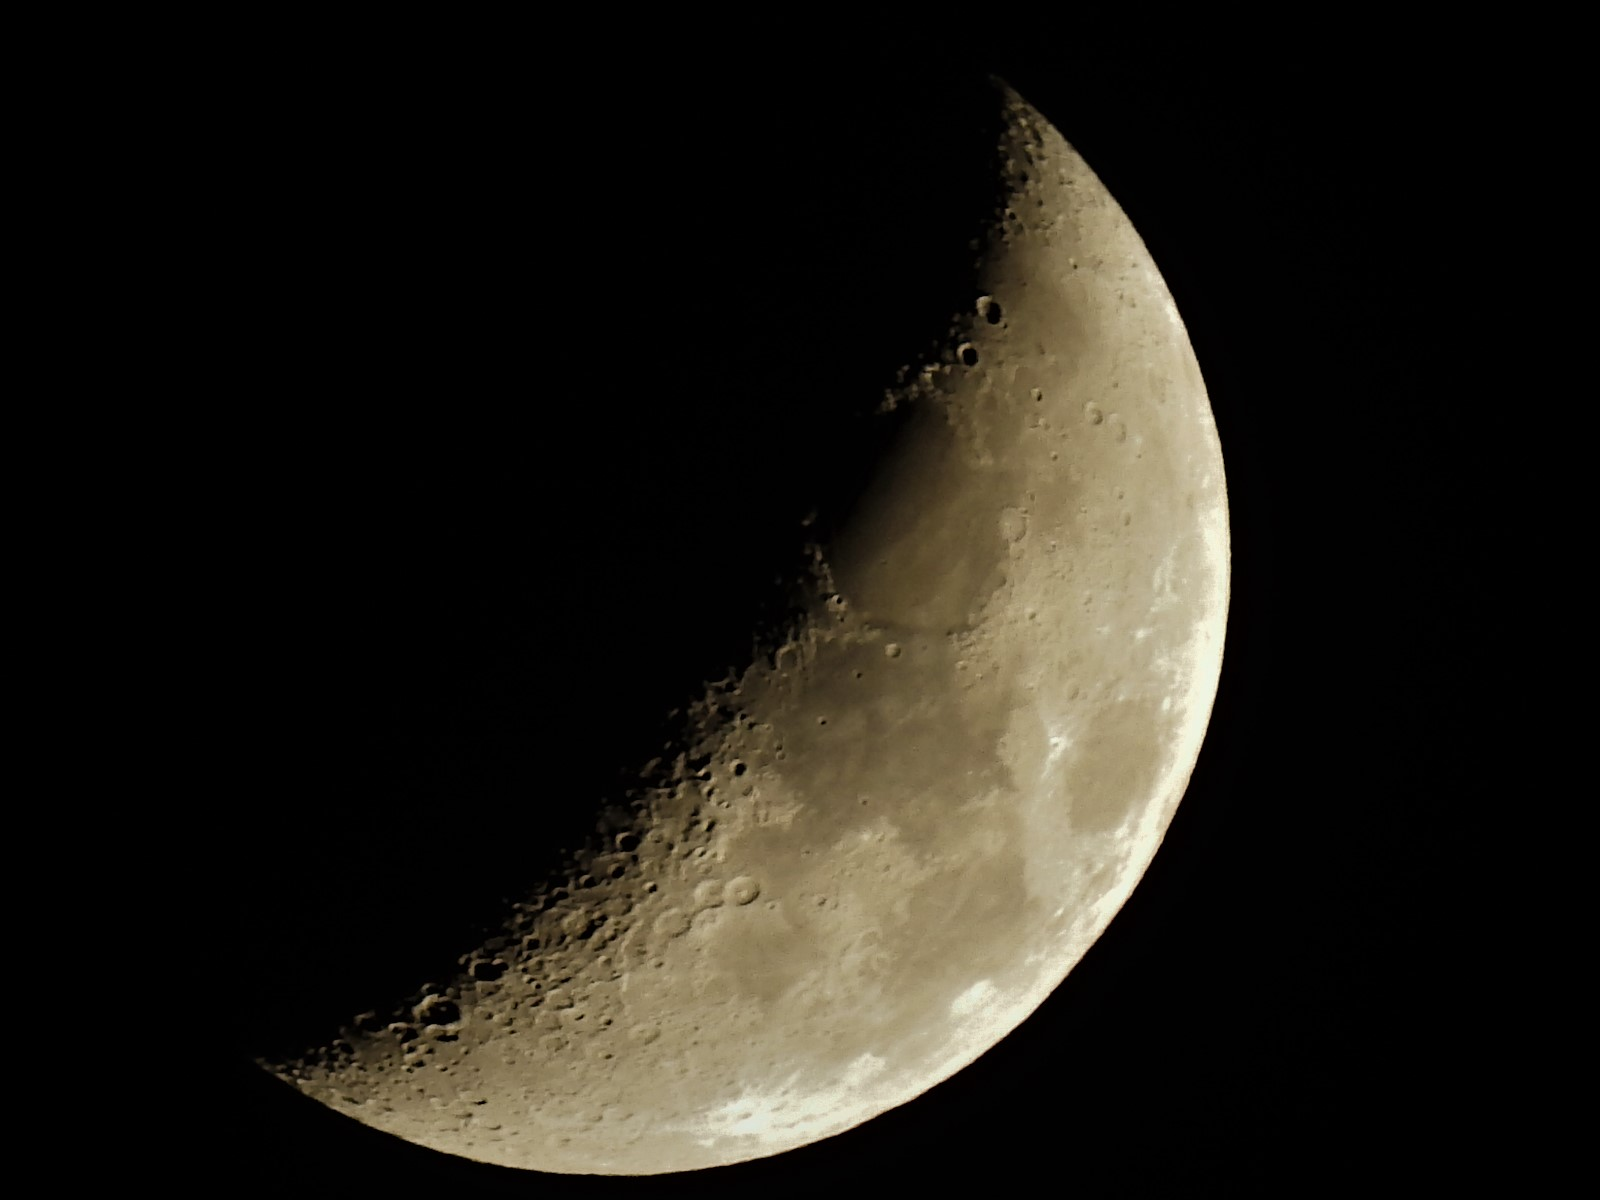 La Luna Hoy 31/01/2020